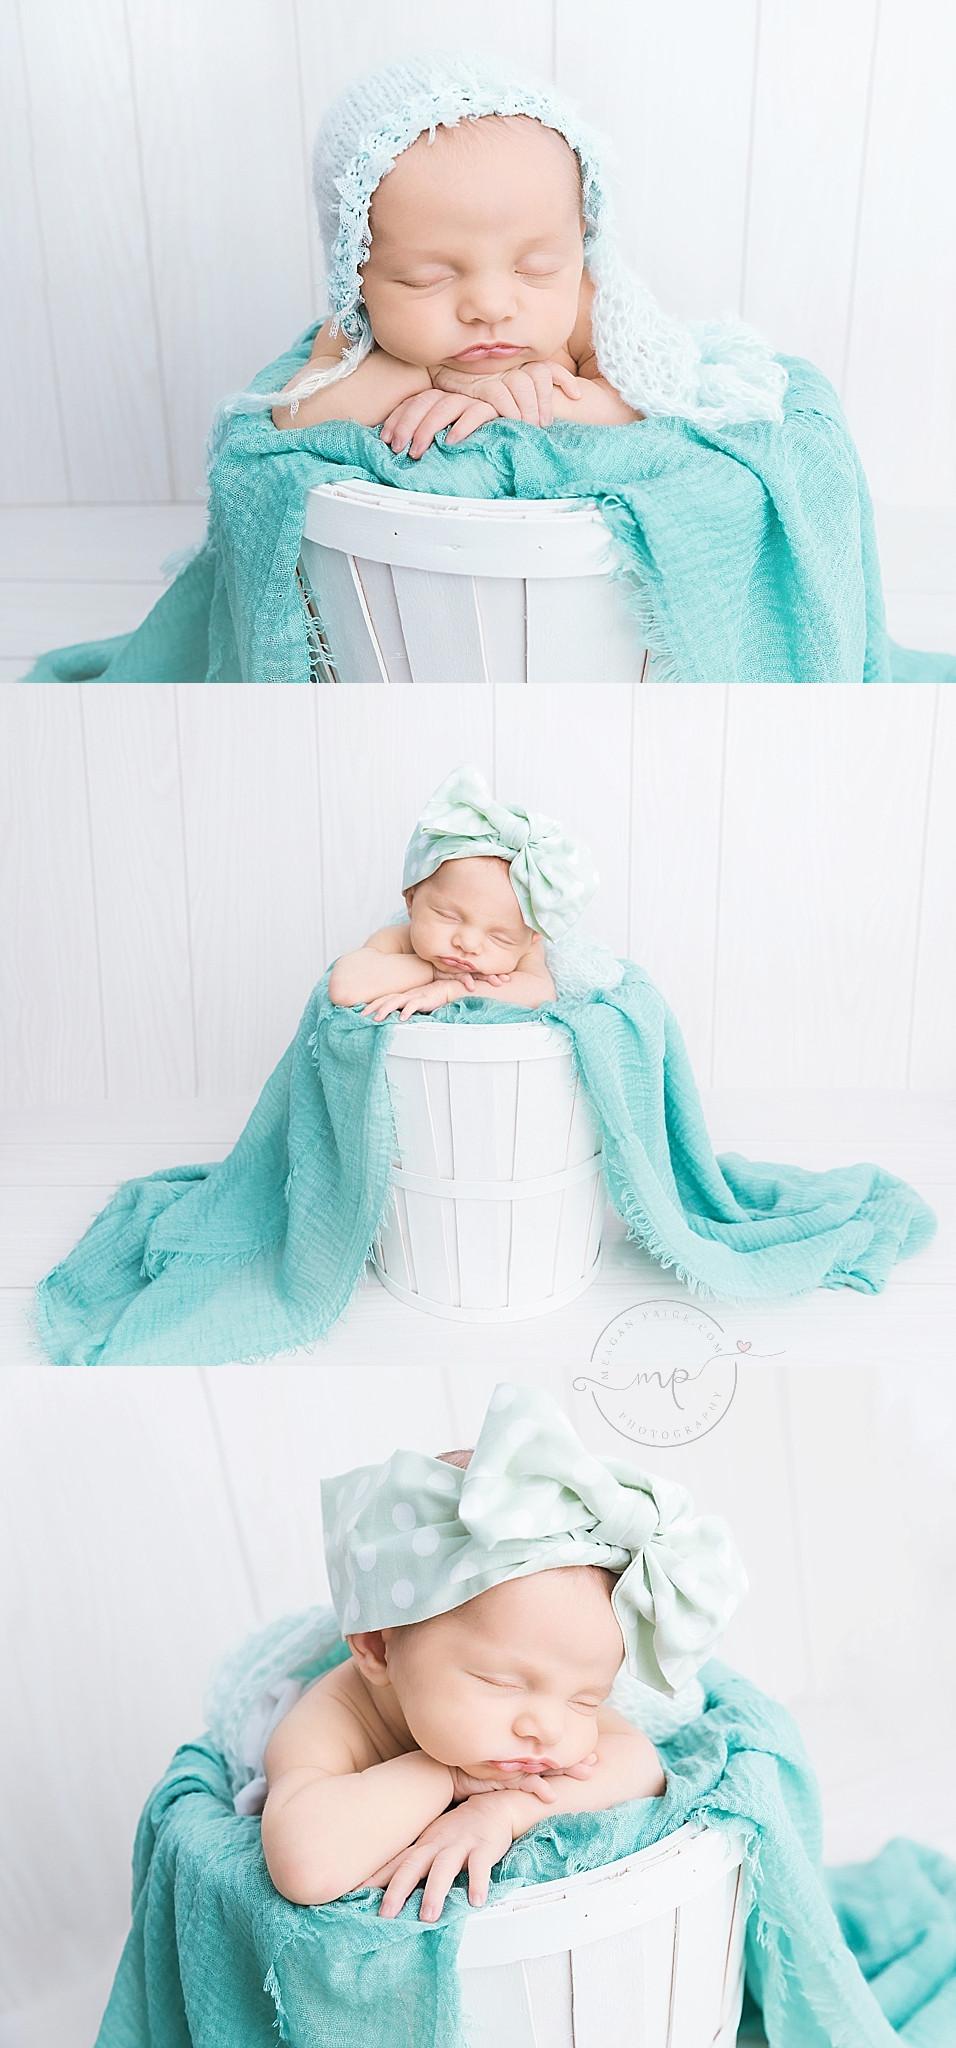 Calgary Newborn Photographer - Baby Girl - Meagan Paige Photography